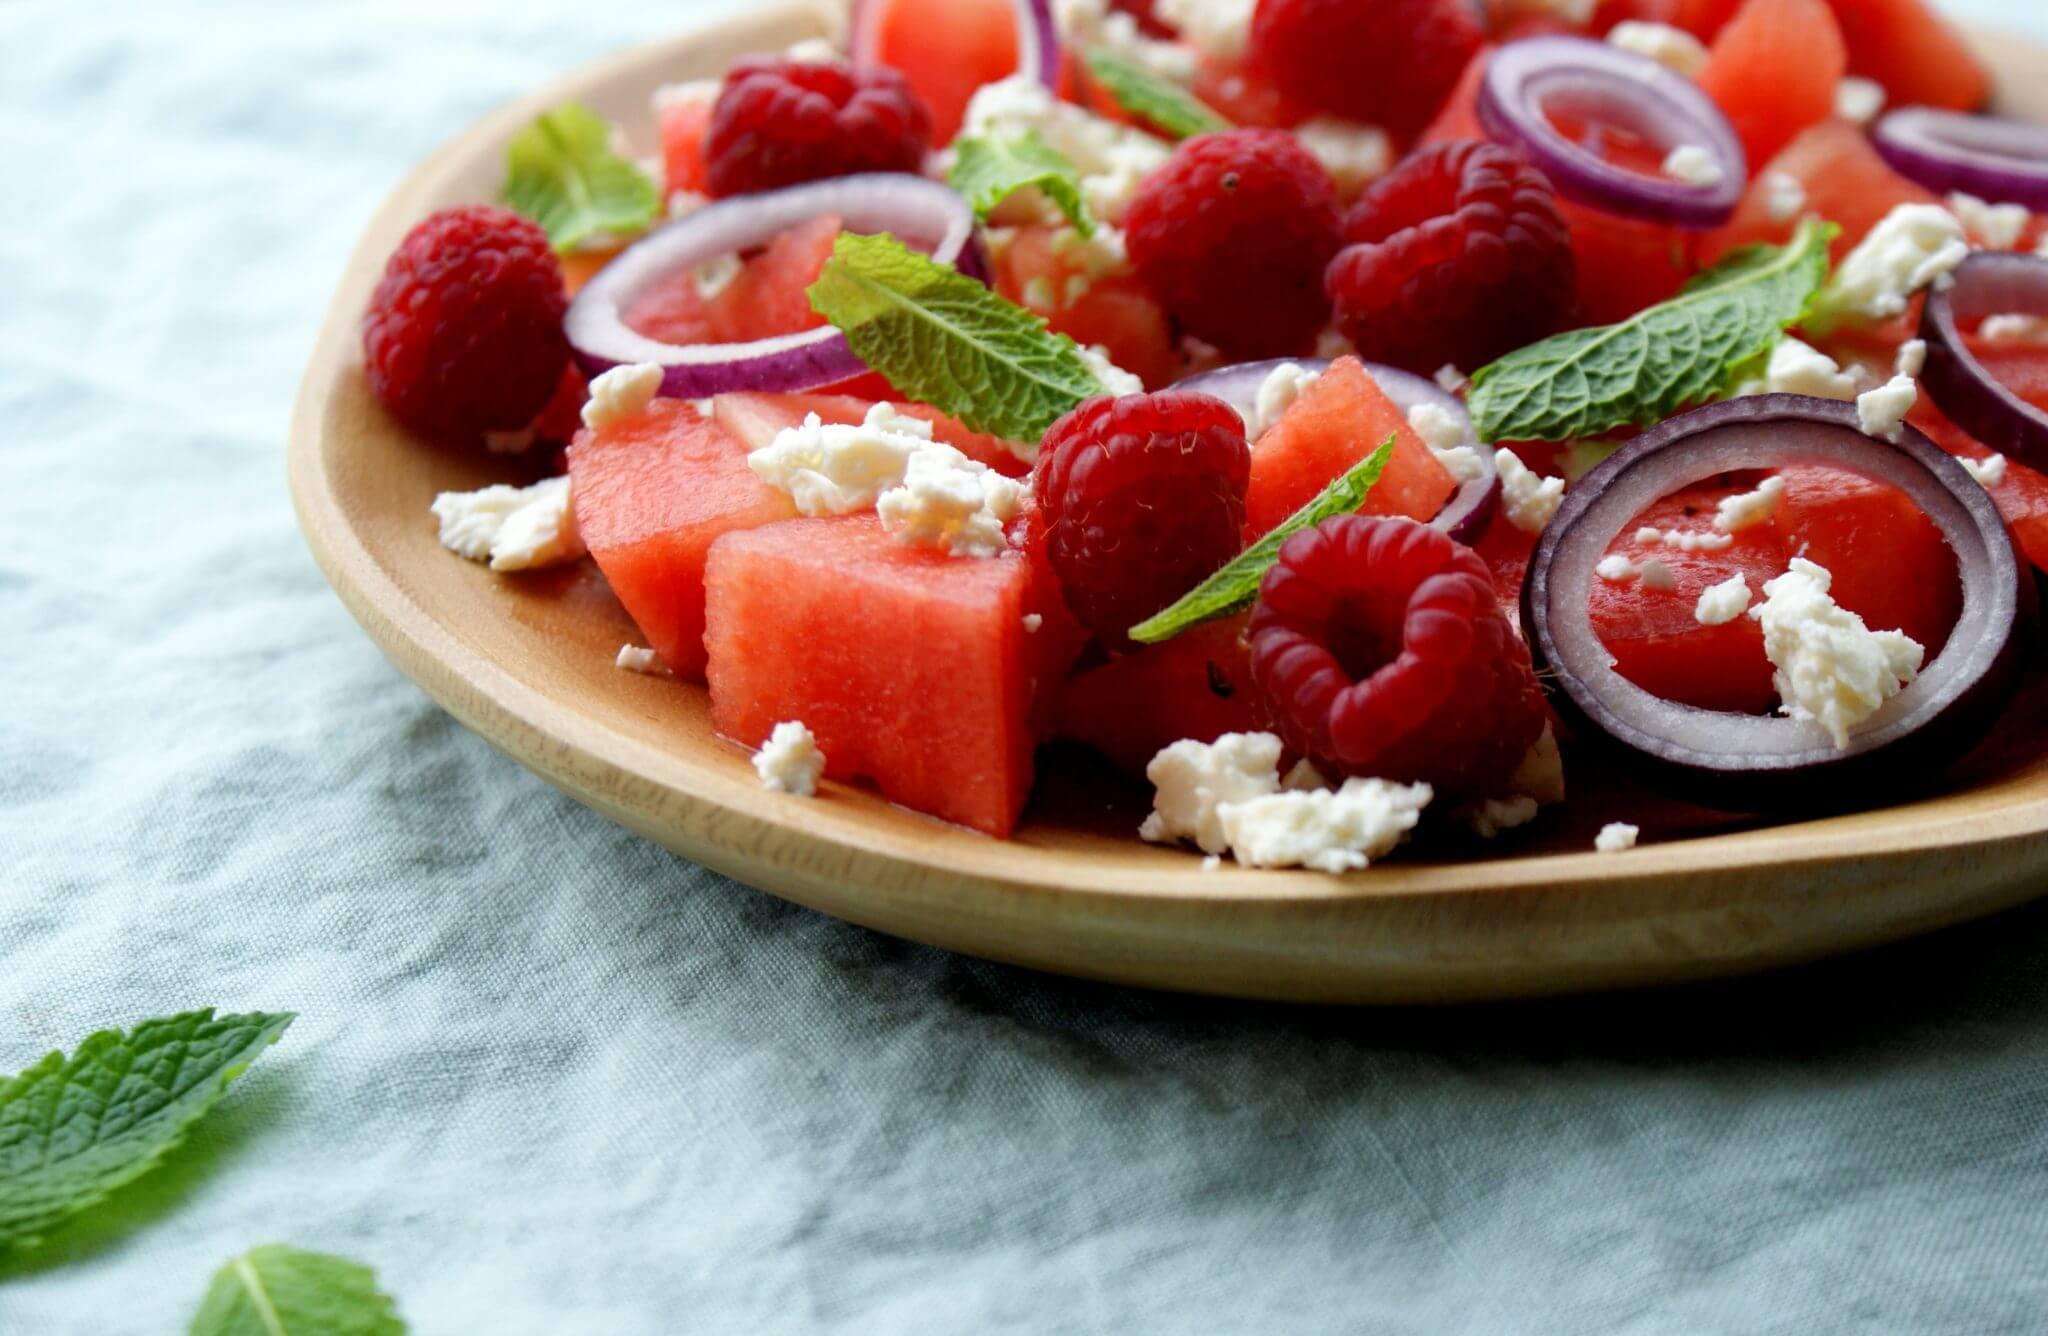 Salade met watermeloen, frambozen en feta